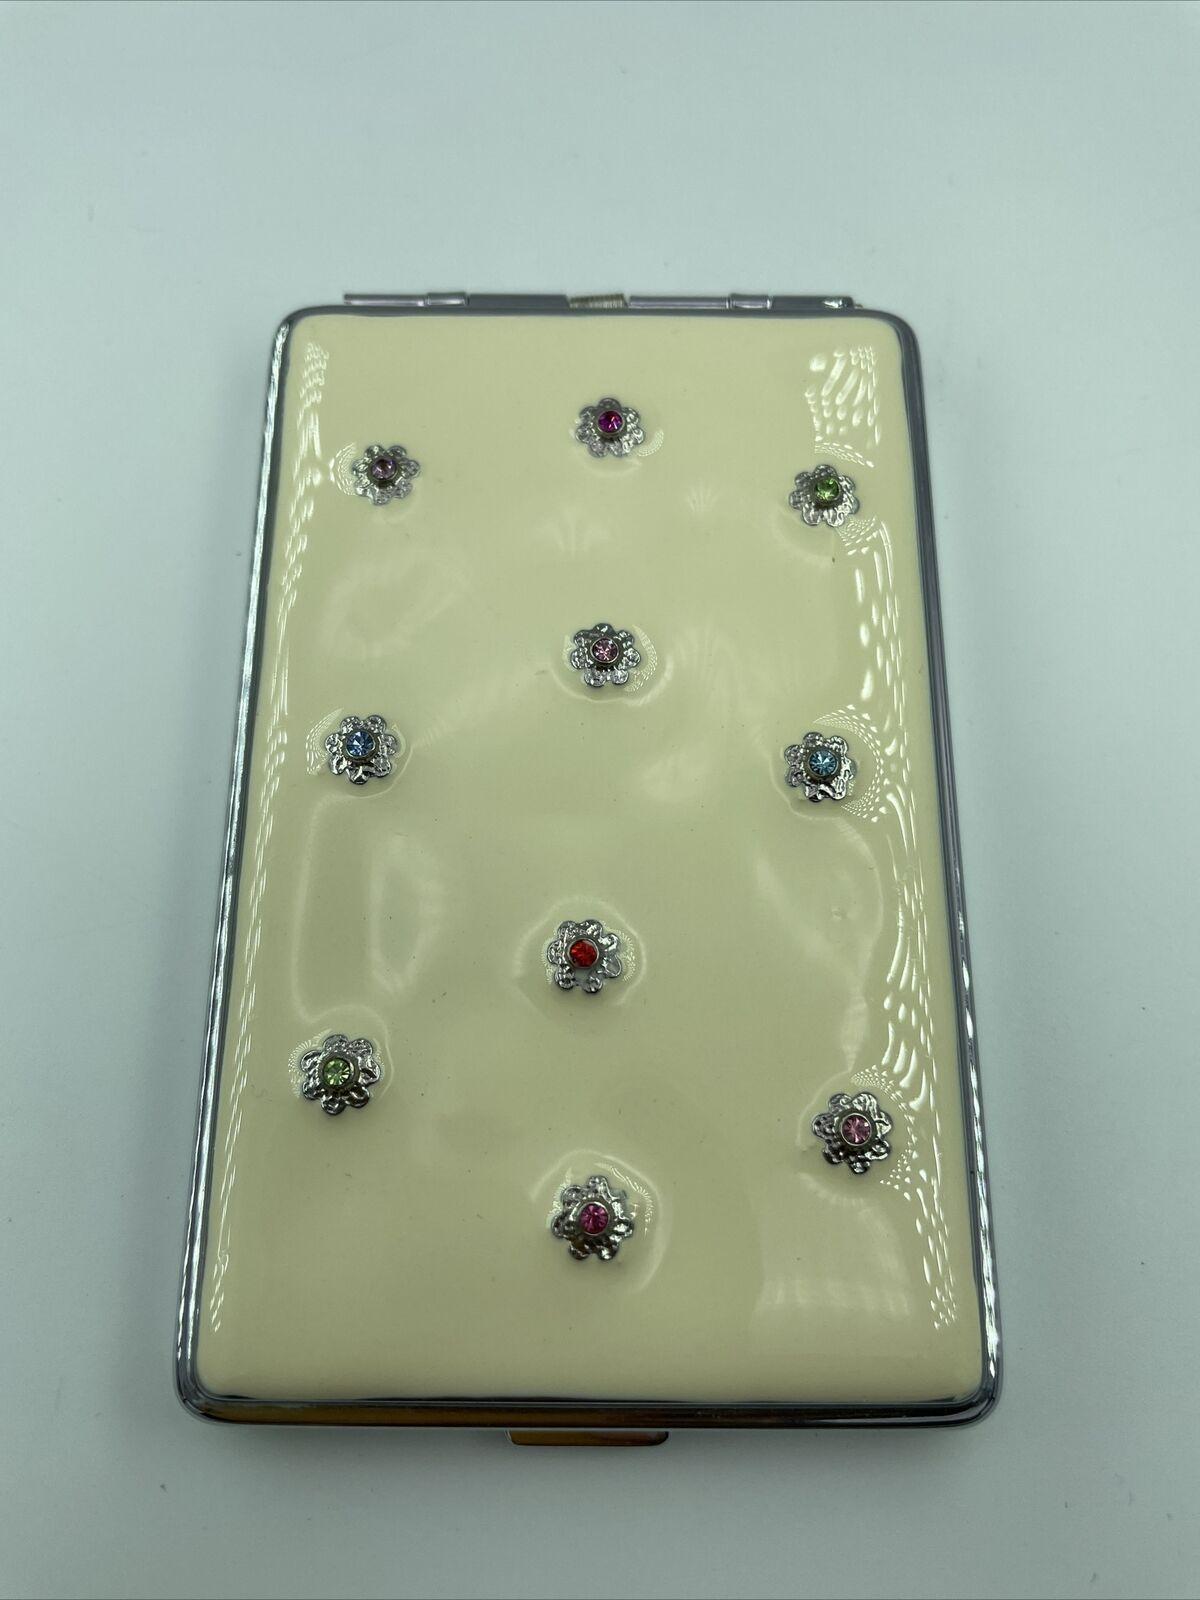 BUSINESS CARD HOLDER+PhoneBook by Spring Street-NEW Swarovski Crystals Gold Pltd